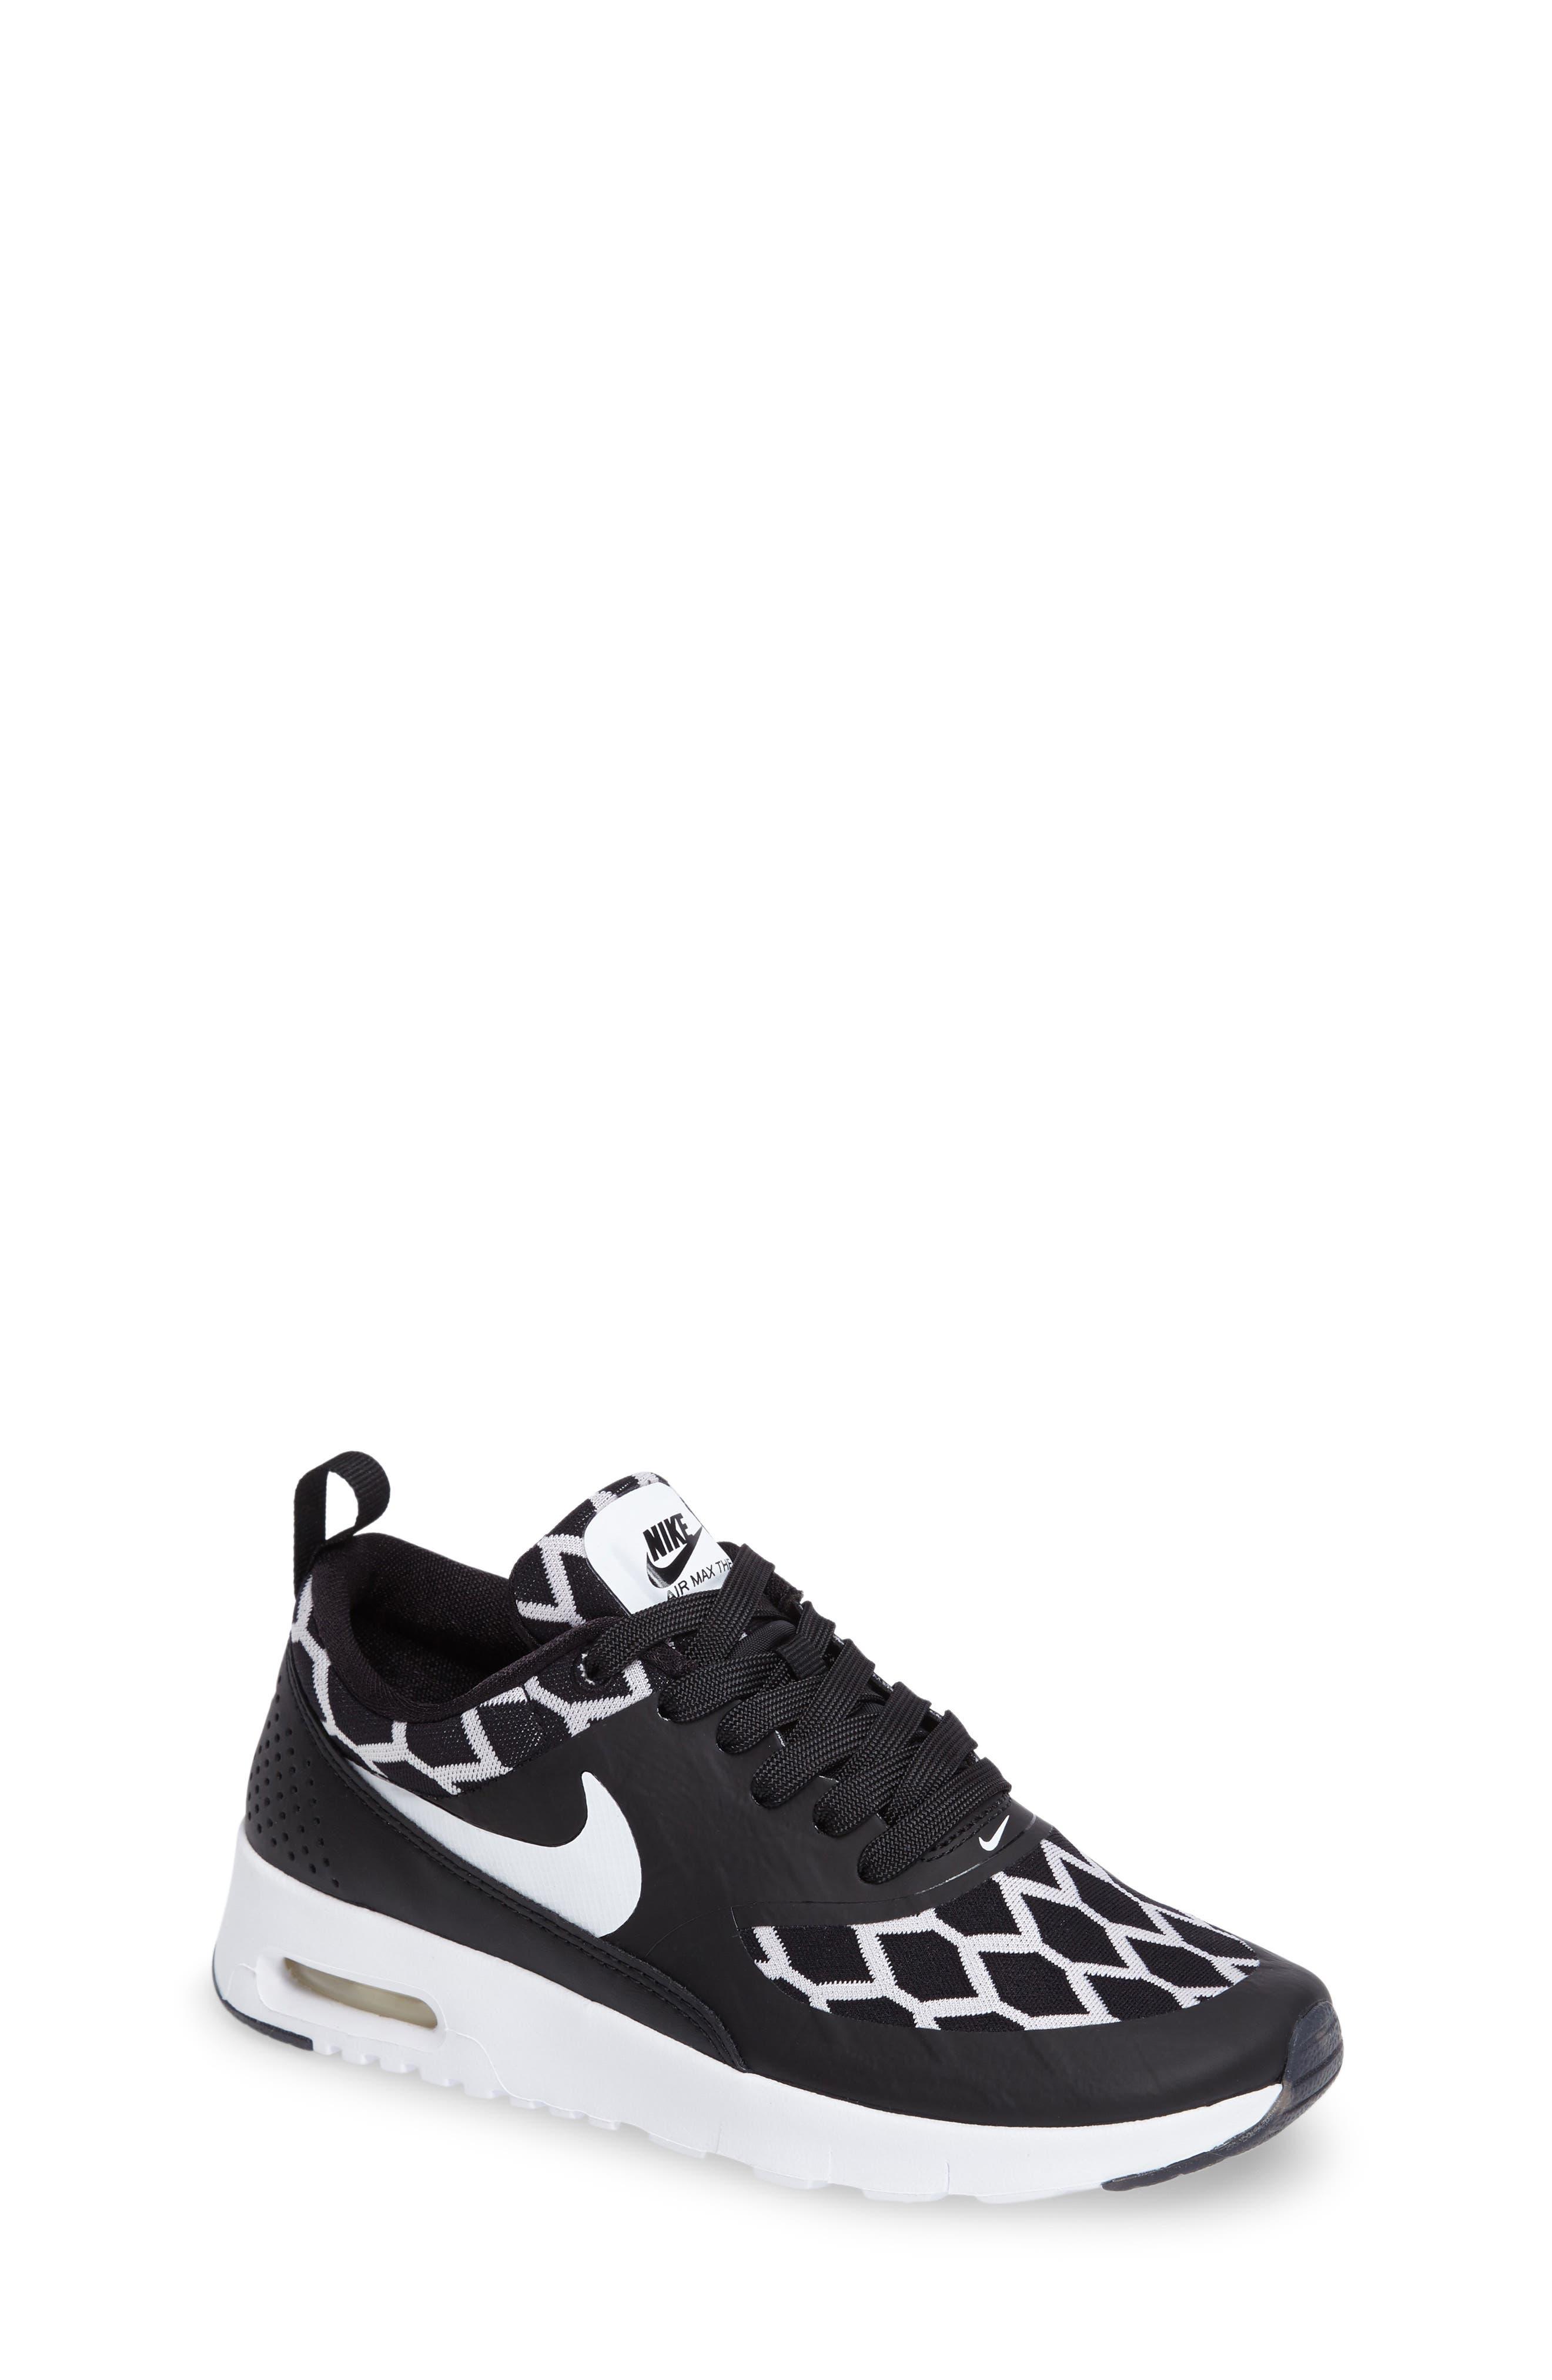 NIKE 'Air Max Thea' Sneaker